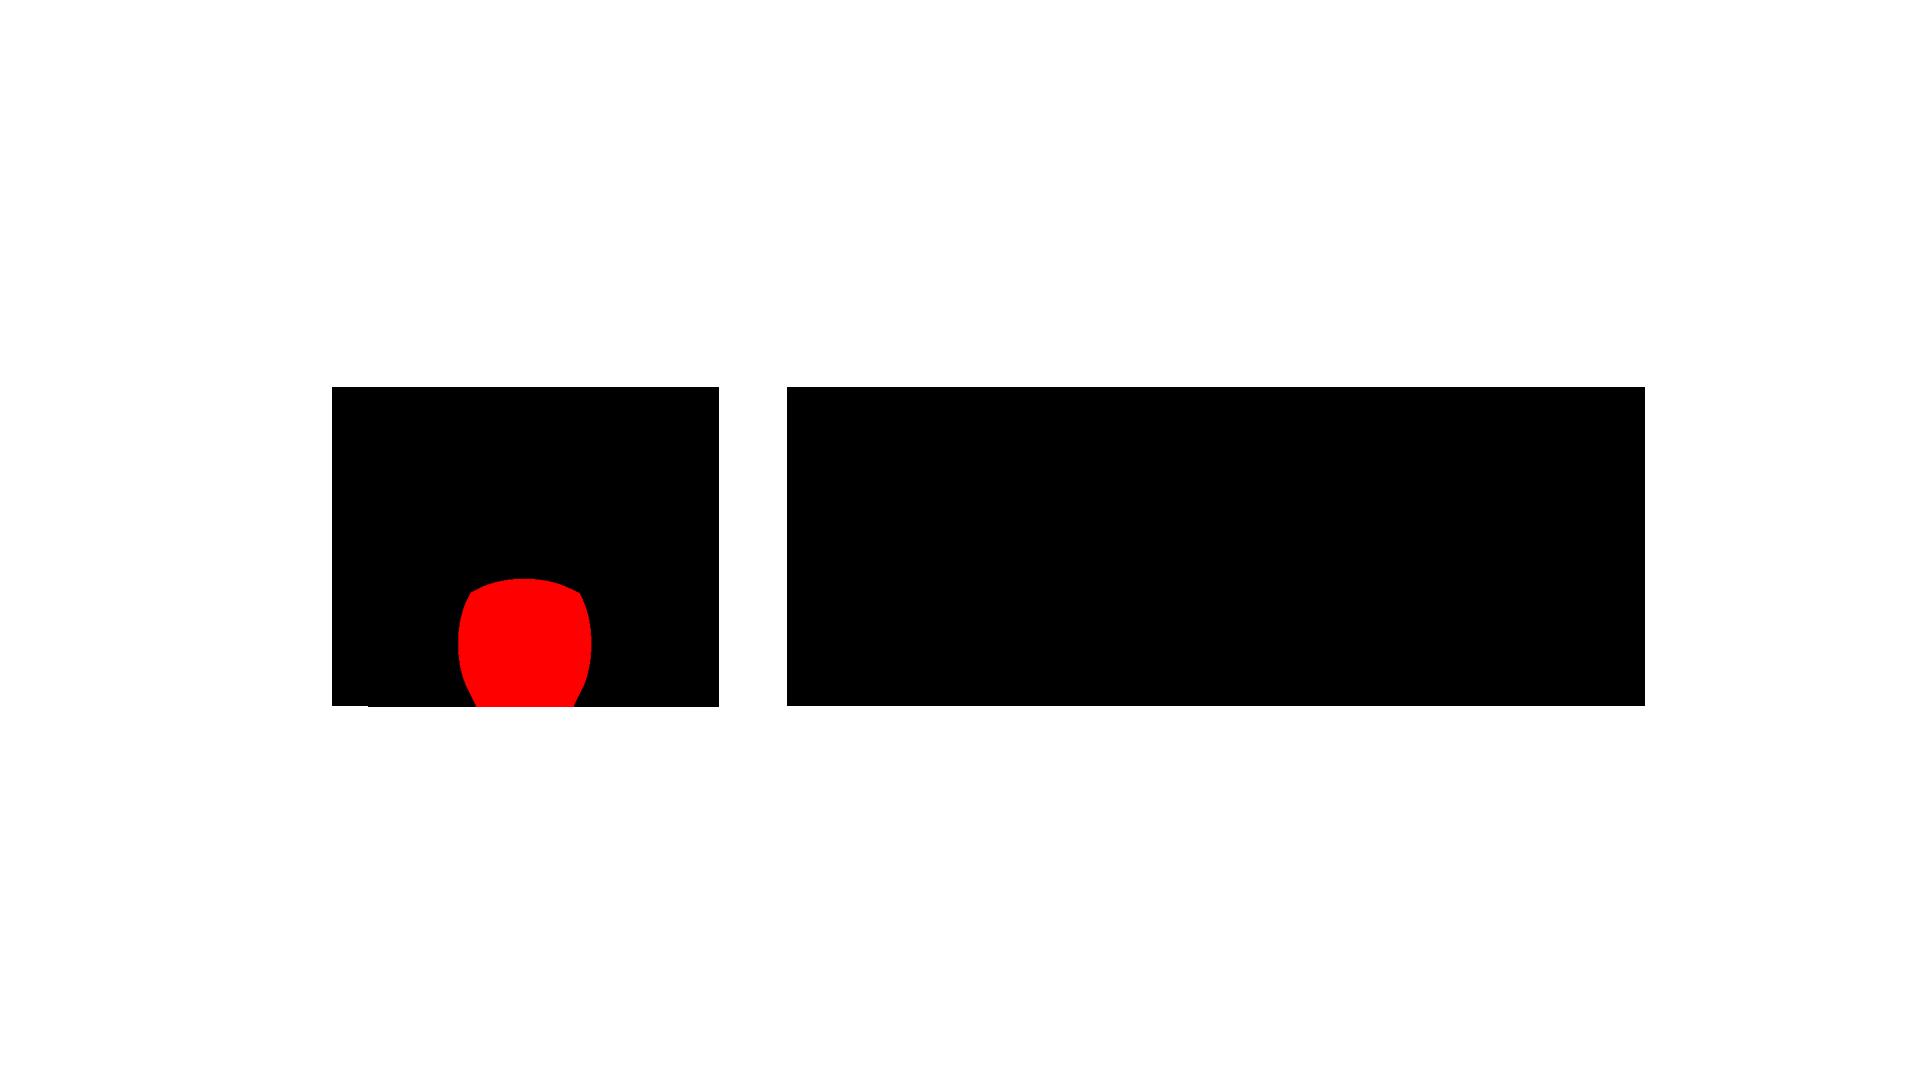 Hamad Bin Khalid hbk contracting logo